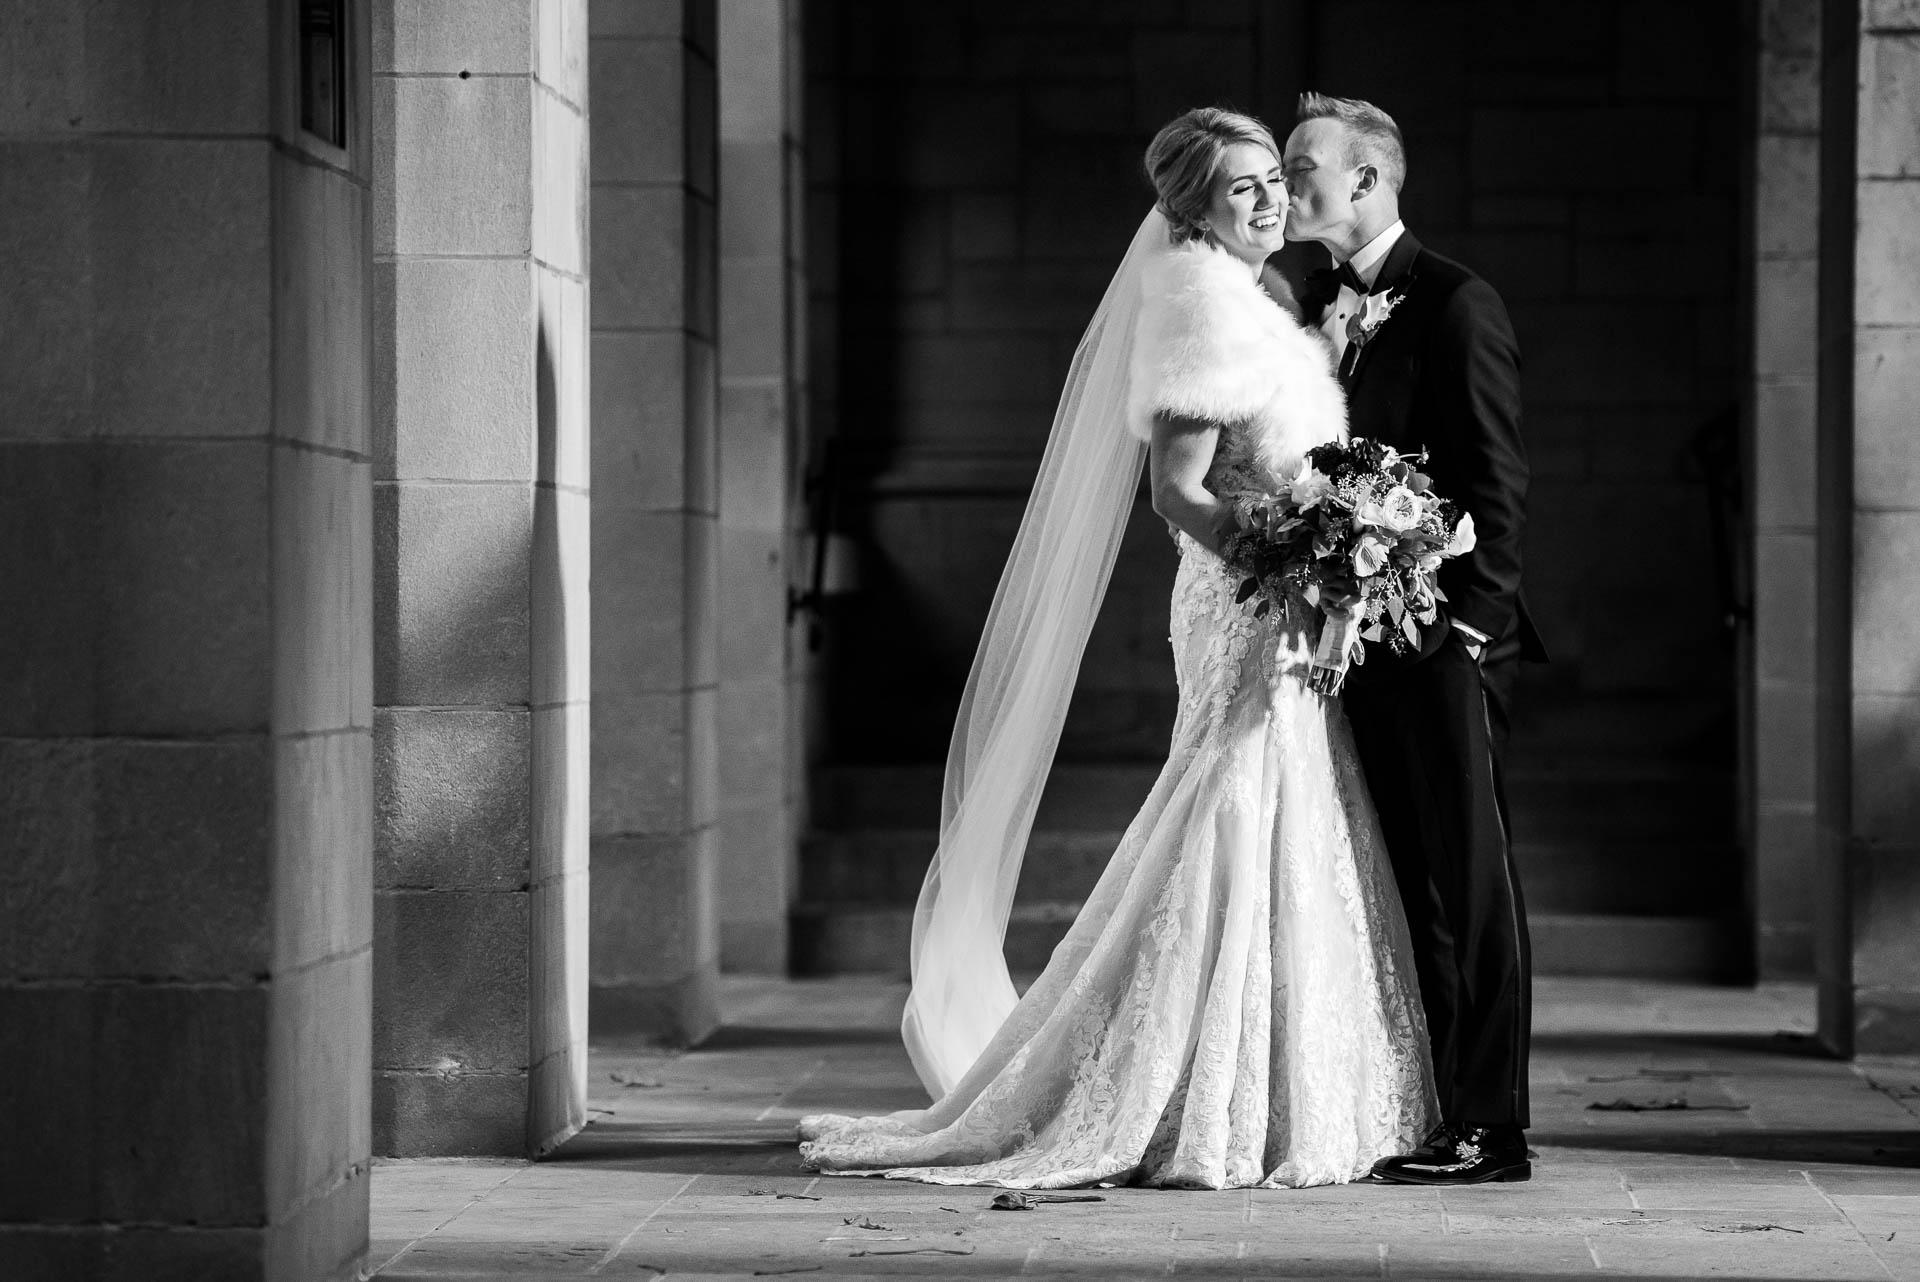 Bride and groom wedding day portrait at Fourth Presbyterian Church in Chicago.